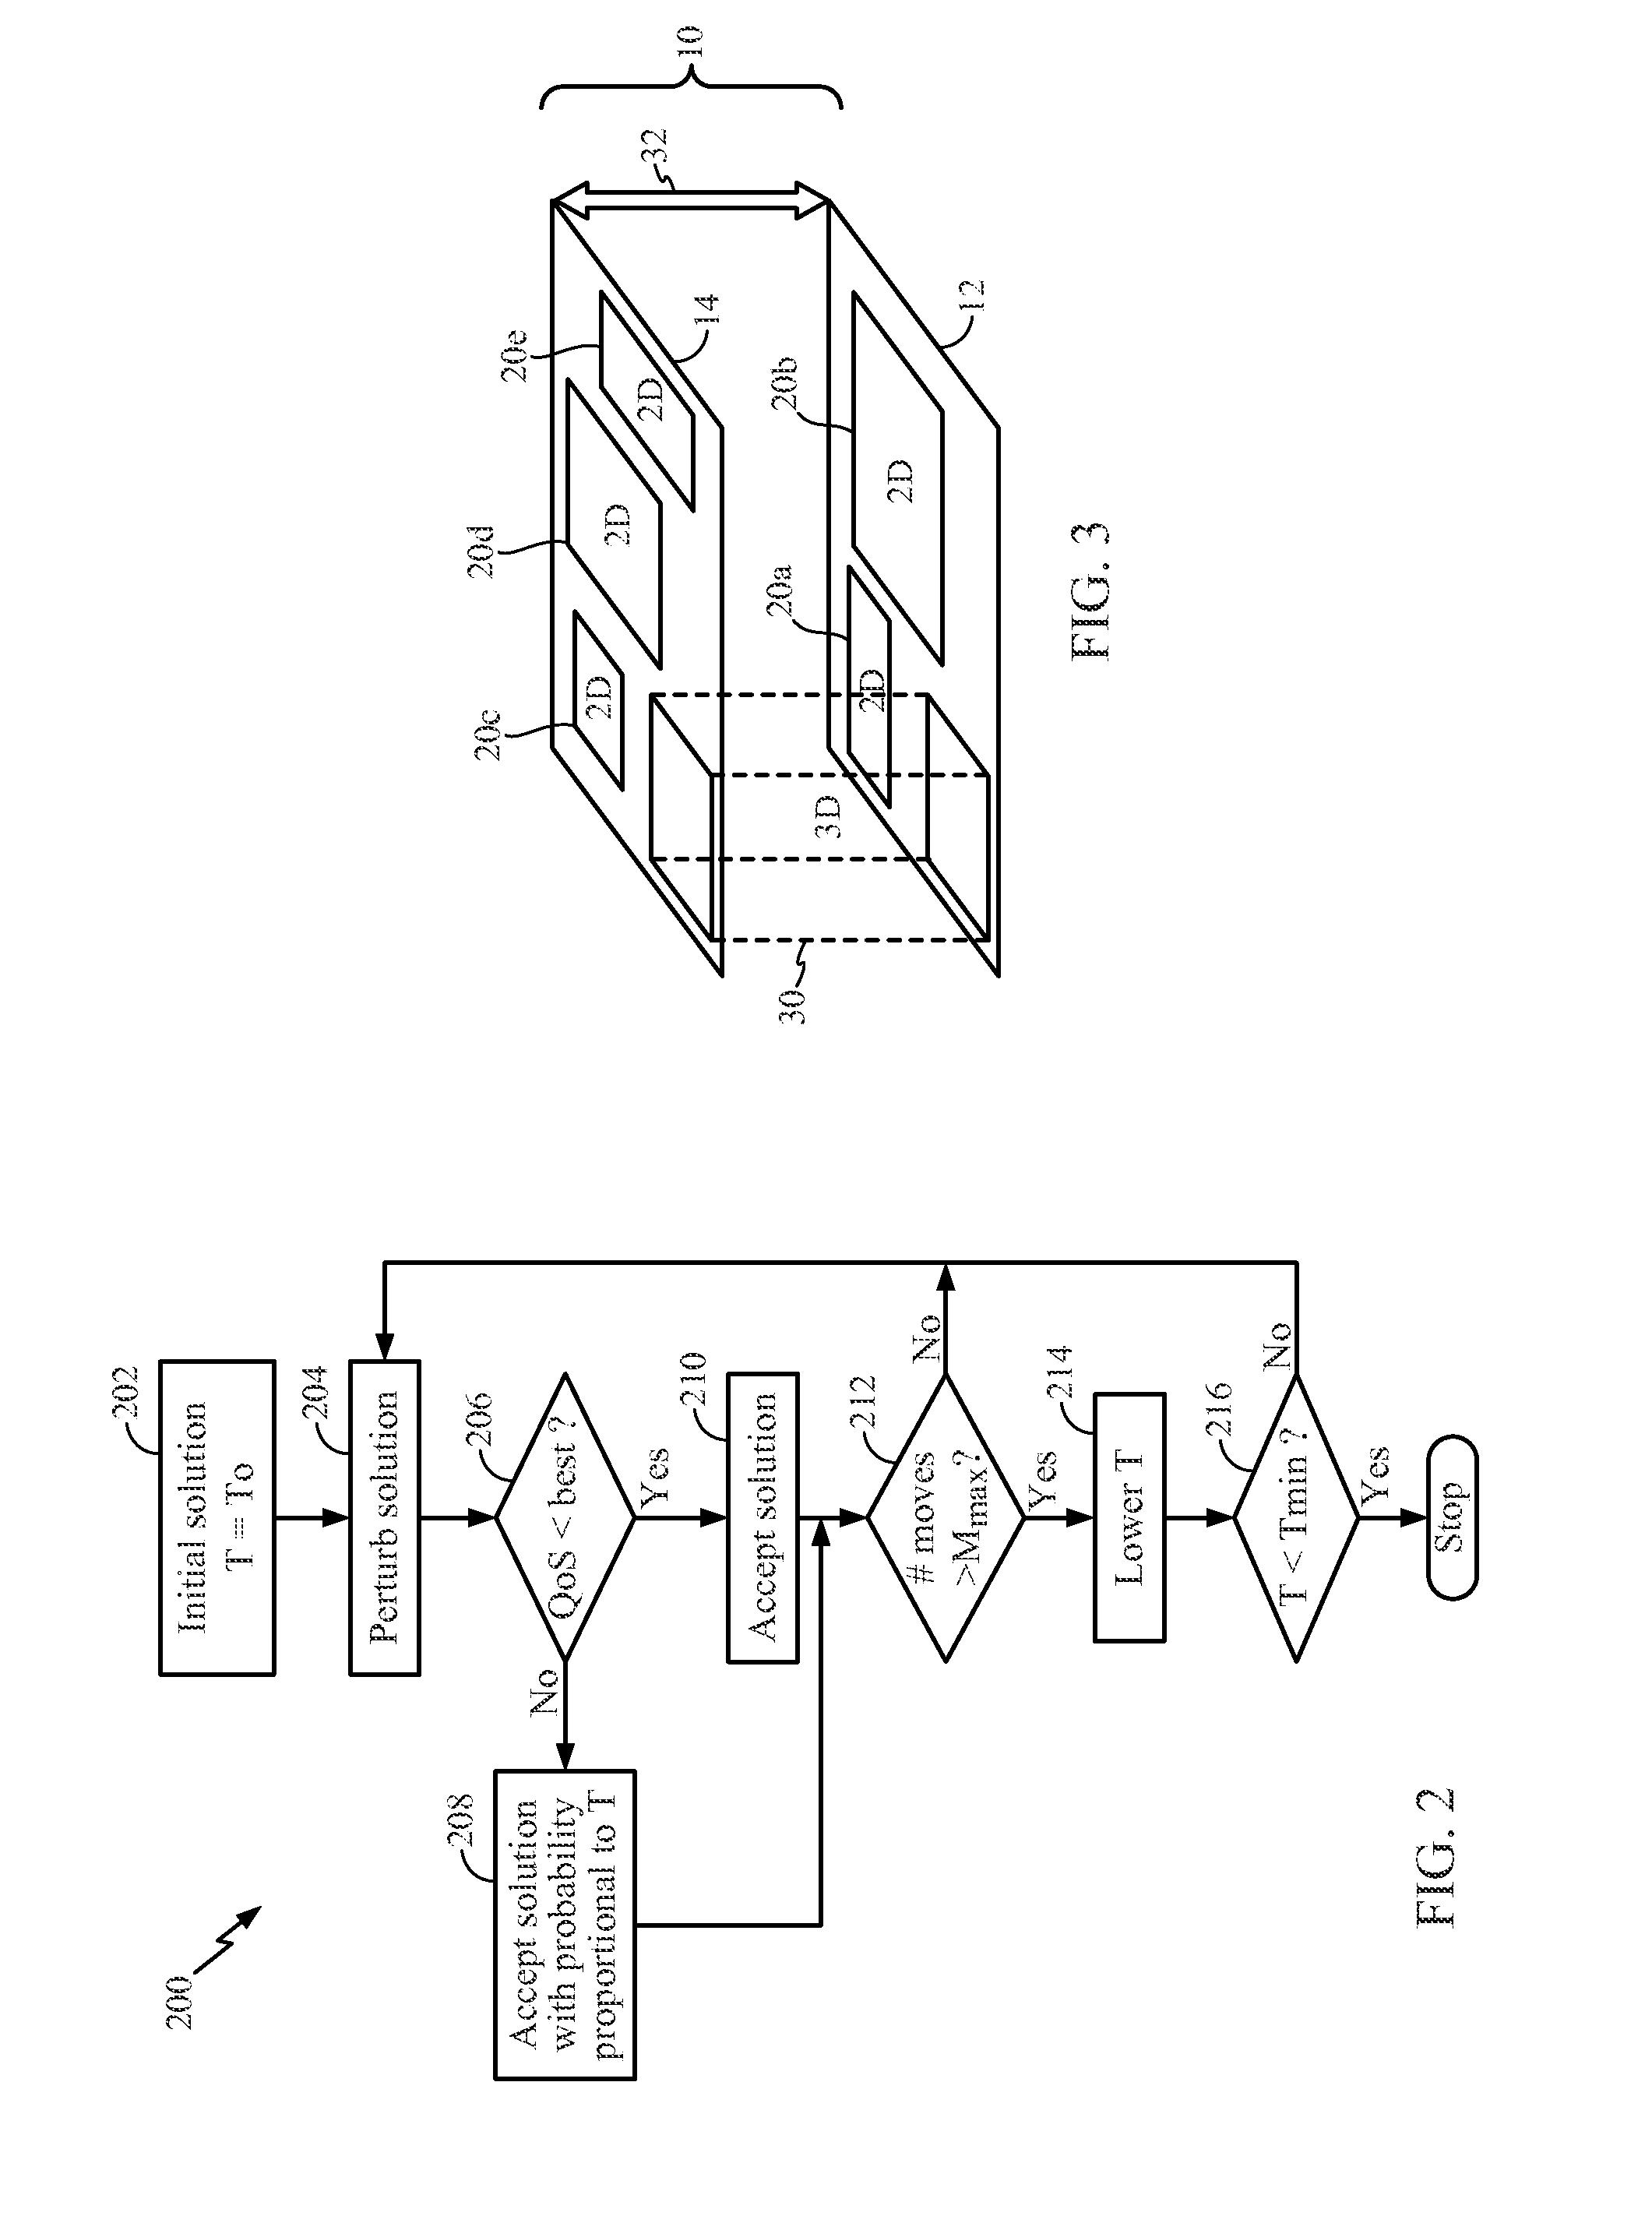 Floorplanning Patente Us20140149958 3d Floorplanning Using 2d And 3d